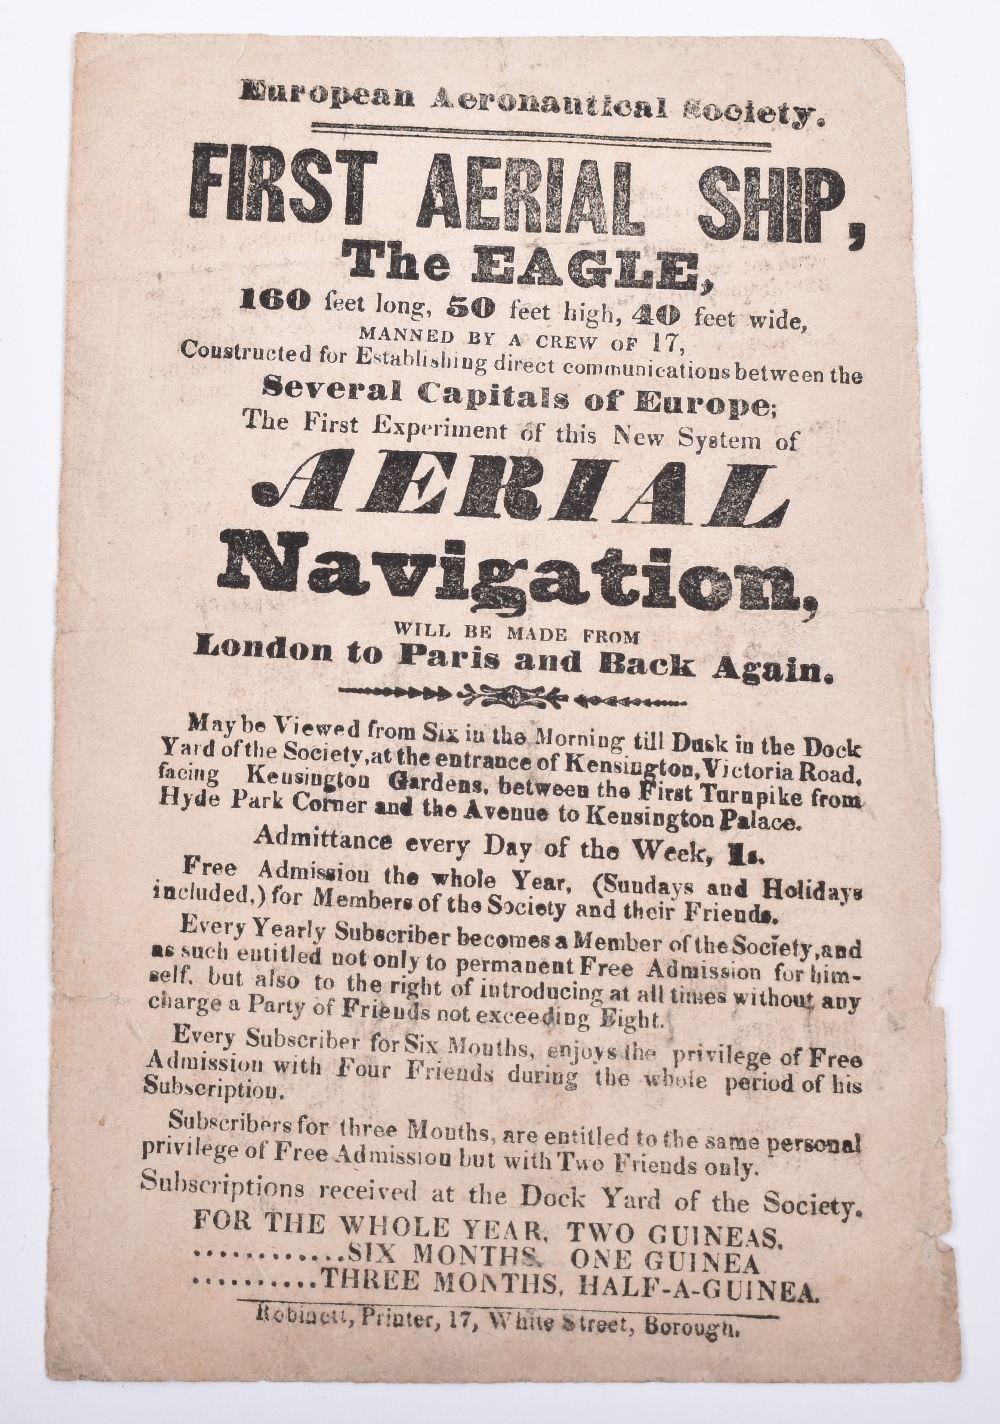 Lot 1 - First Aerial Ship the Eagle, Original Handbill from 1835